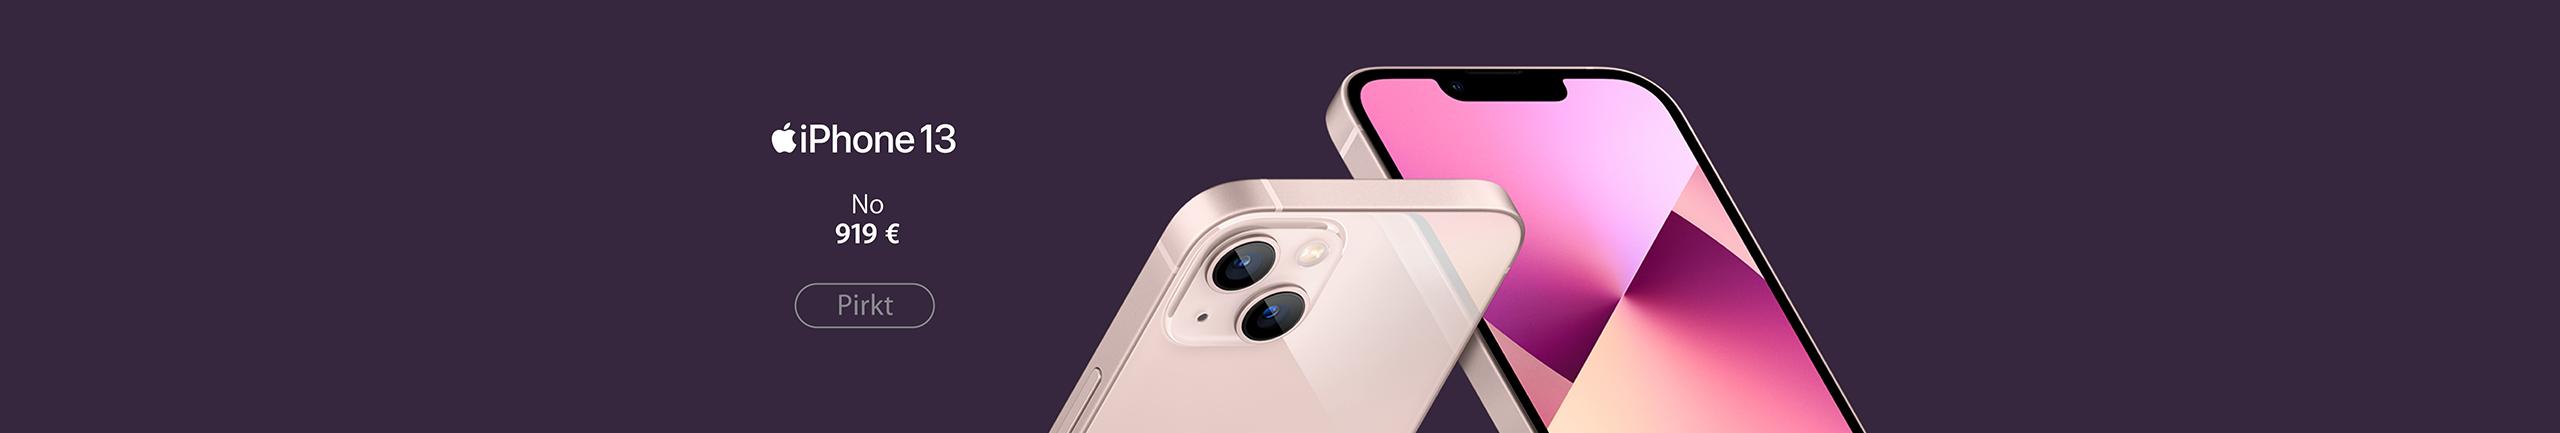 PL iphone 13 preorder